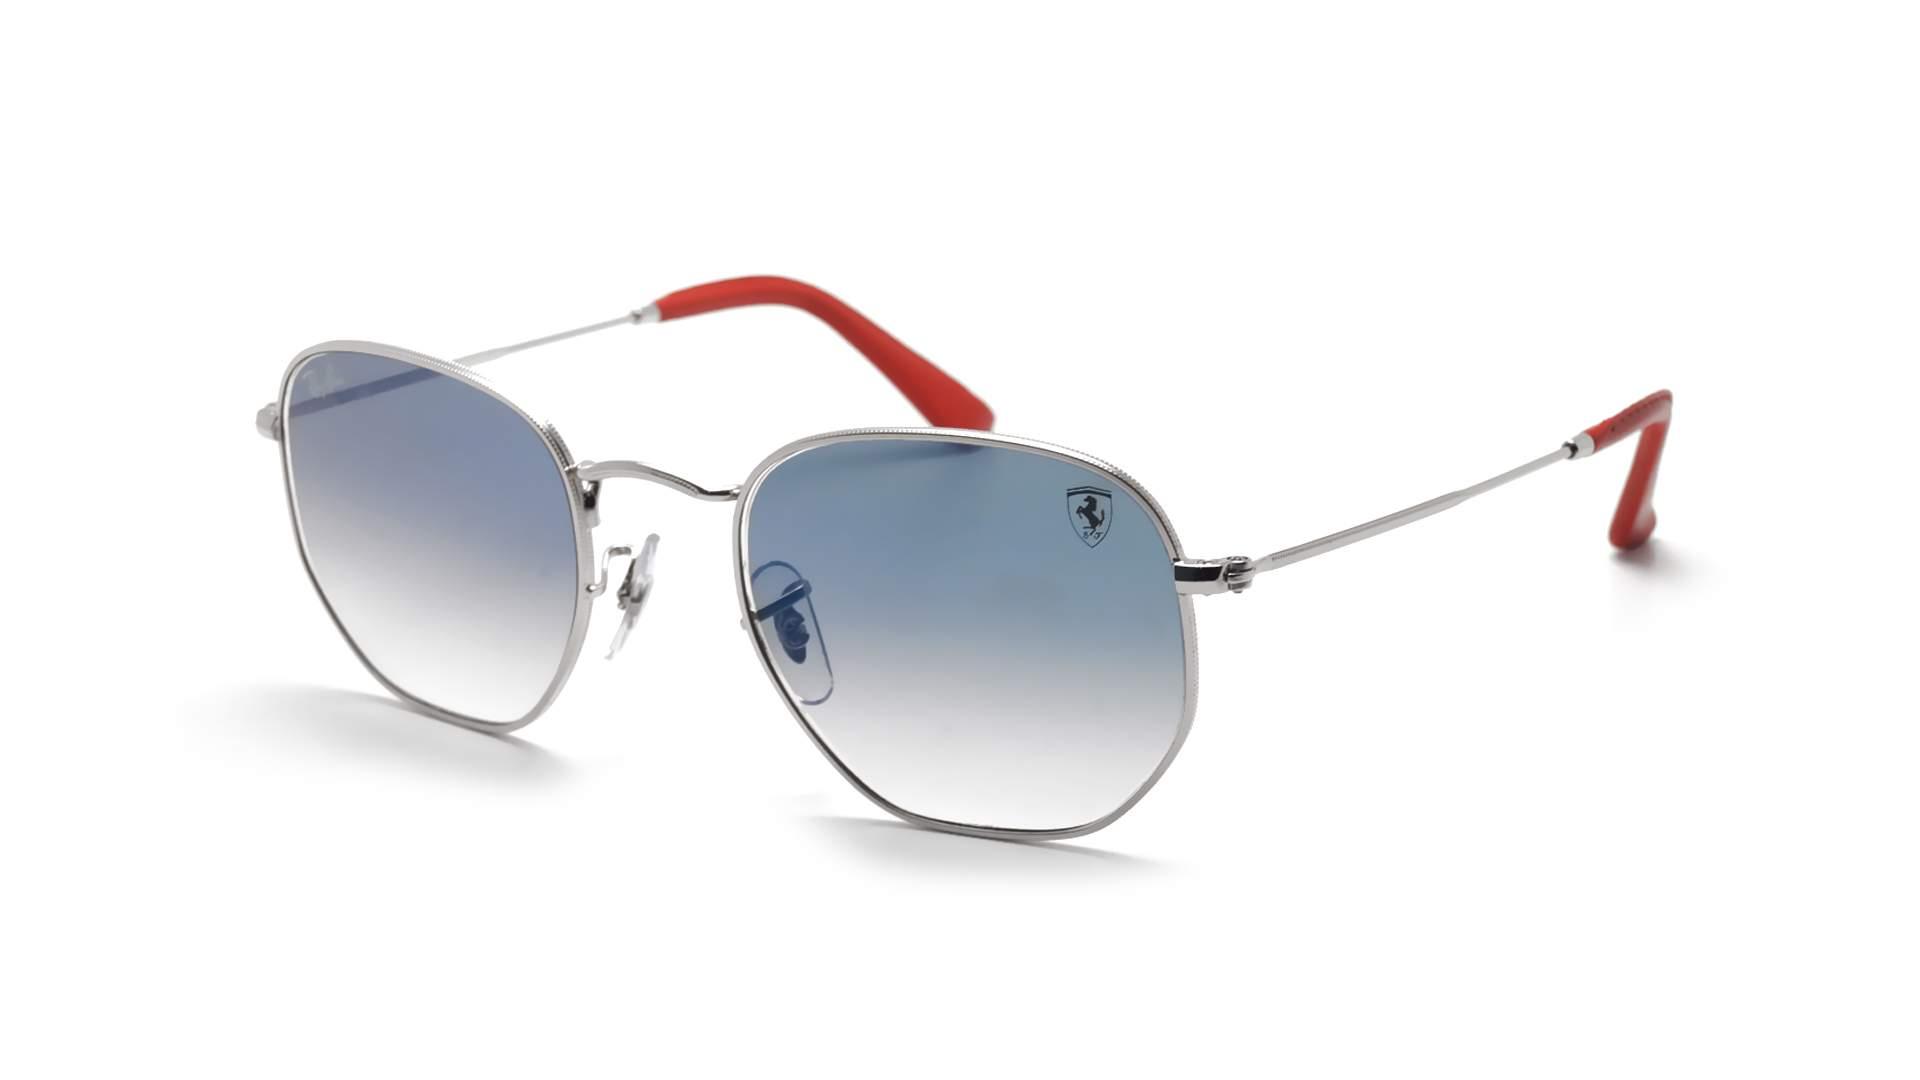 a8f8d9e5ebc Sunglasses Ray-Ban Hexagonal Scuderia Ferrari Silver RB3548NM F007 3F 51-21  Medium Gradient